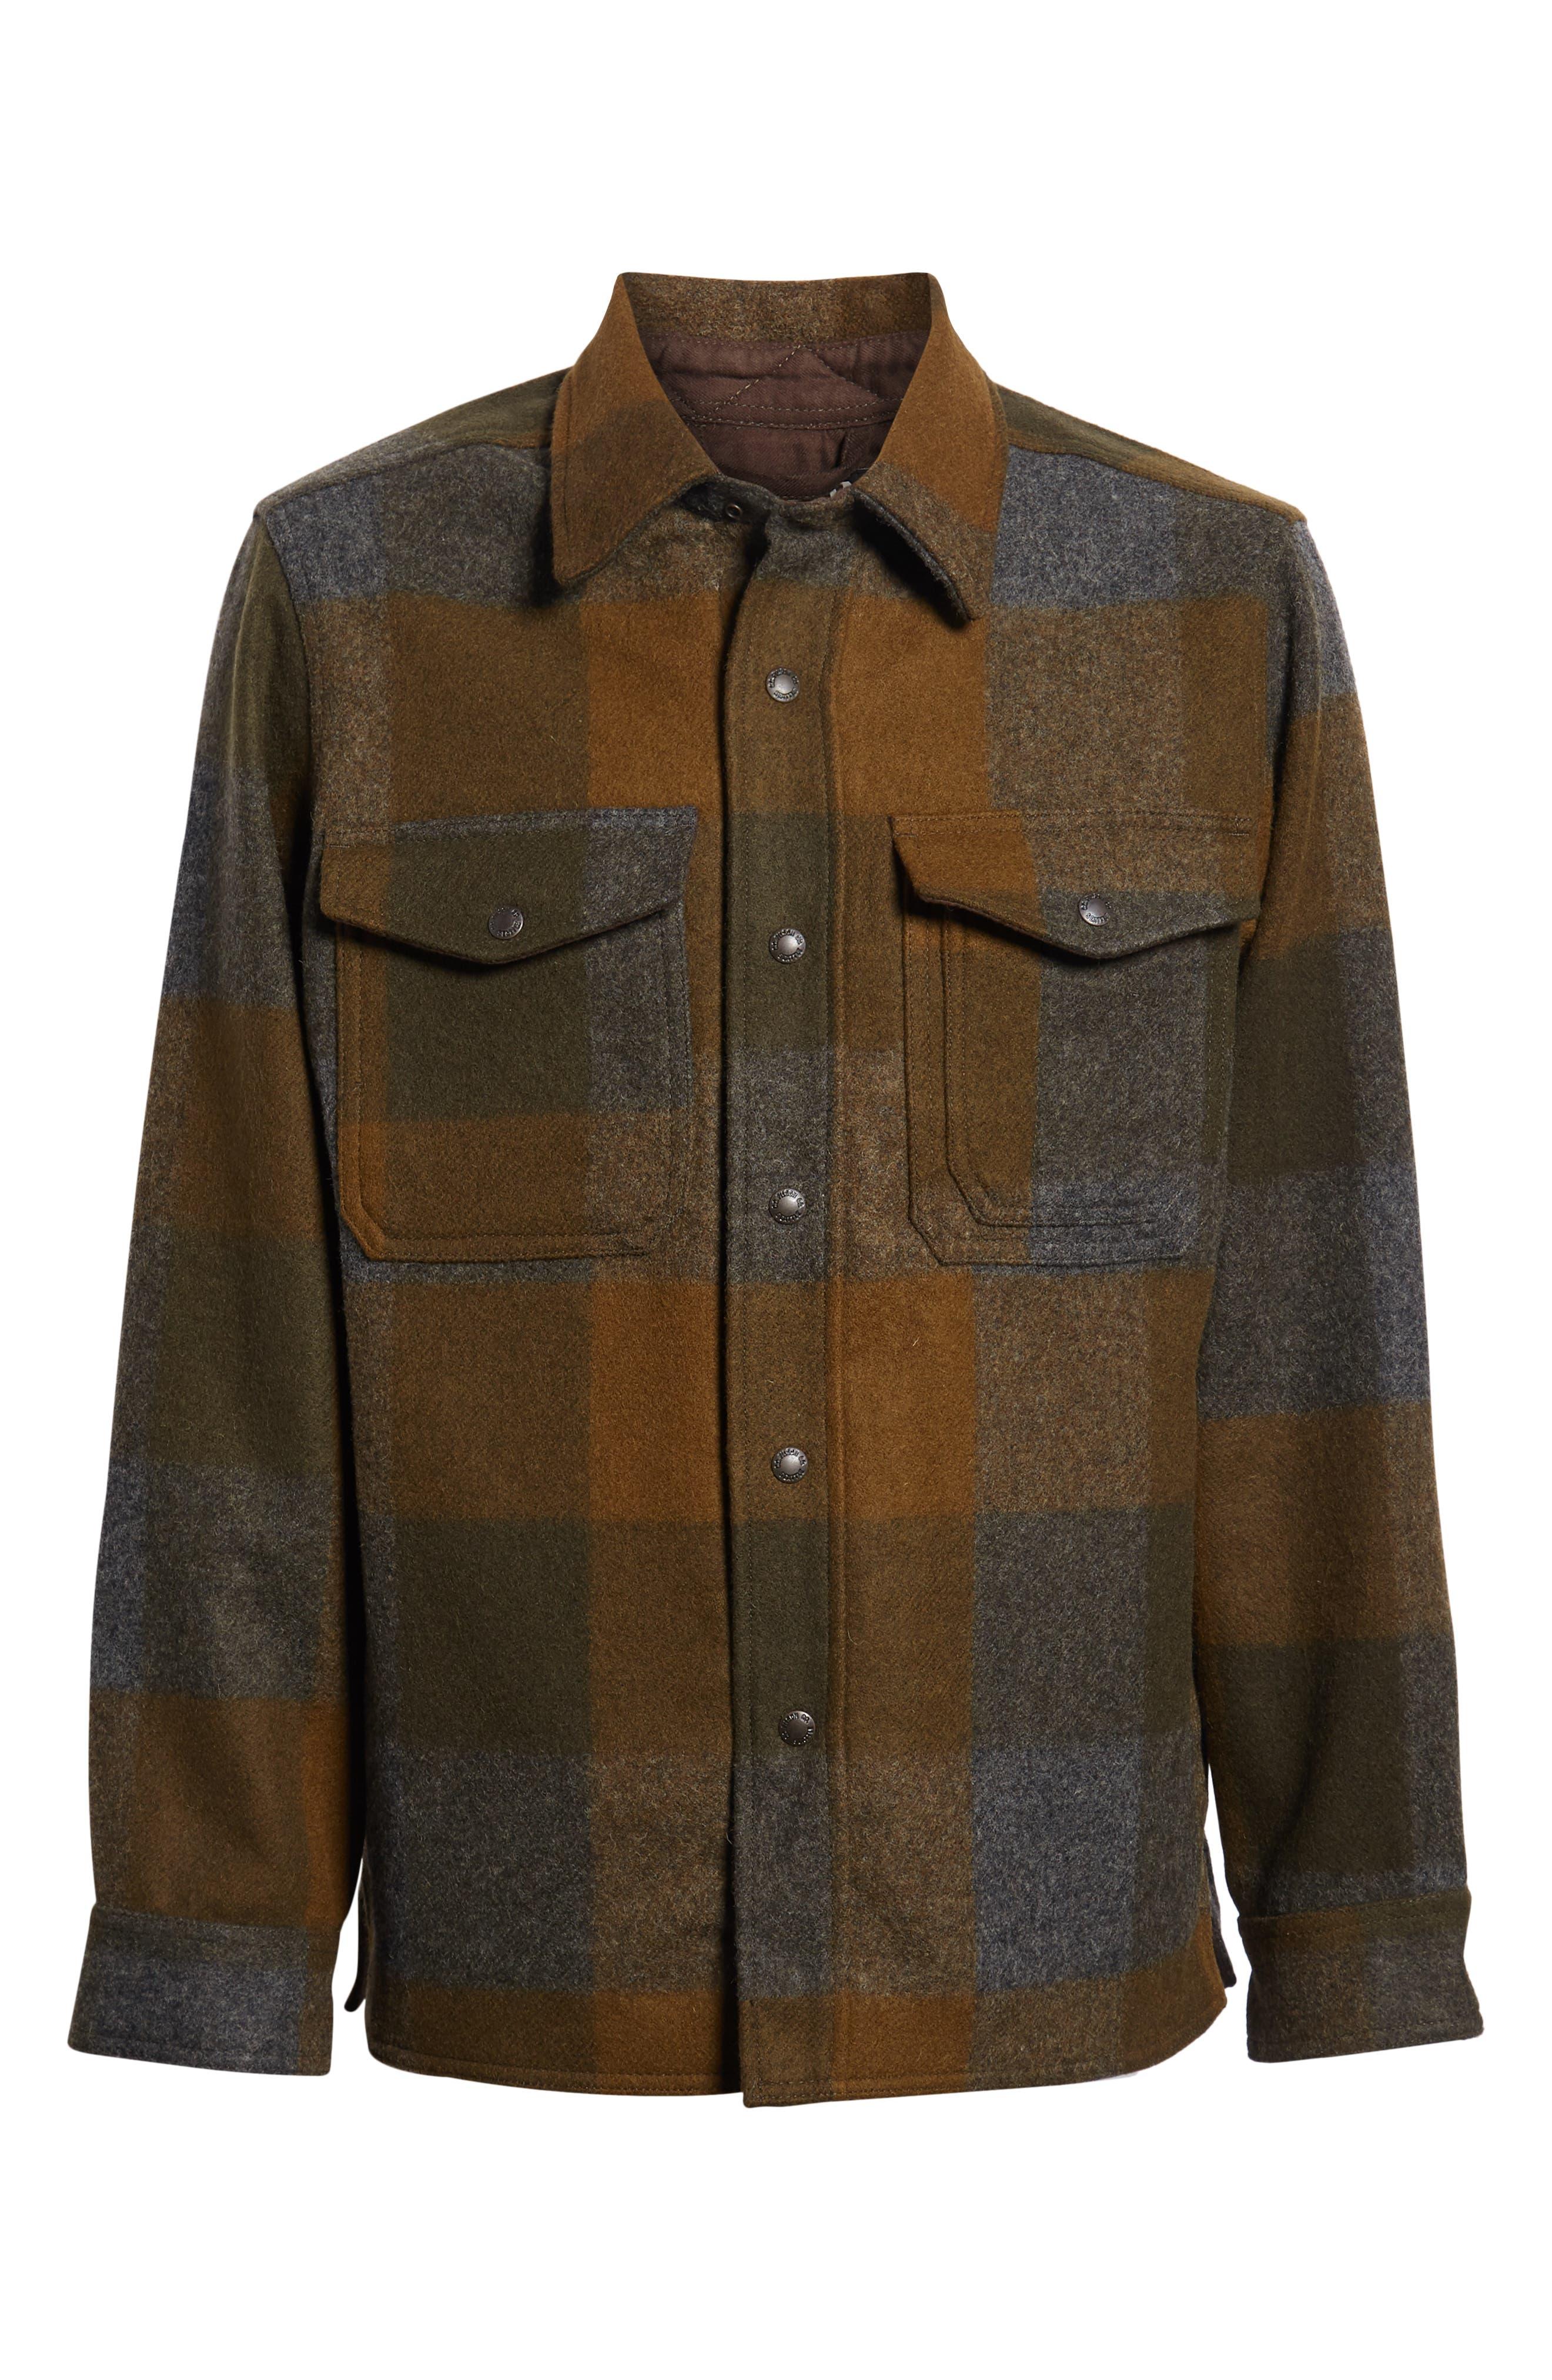 Mackinaw Plaid Wool Flannel Shirt Jacket,                             Alternate thumbnail 6, color,                             233